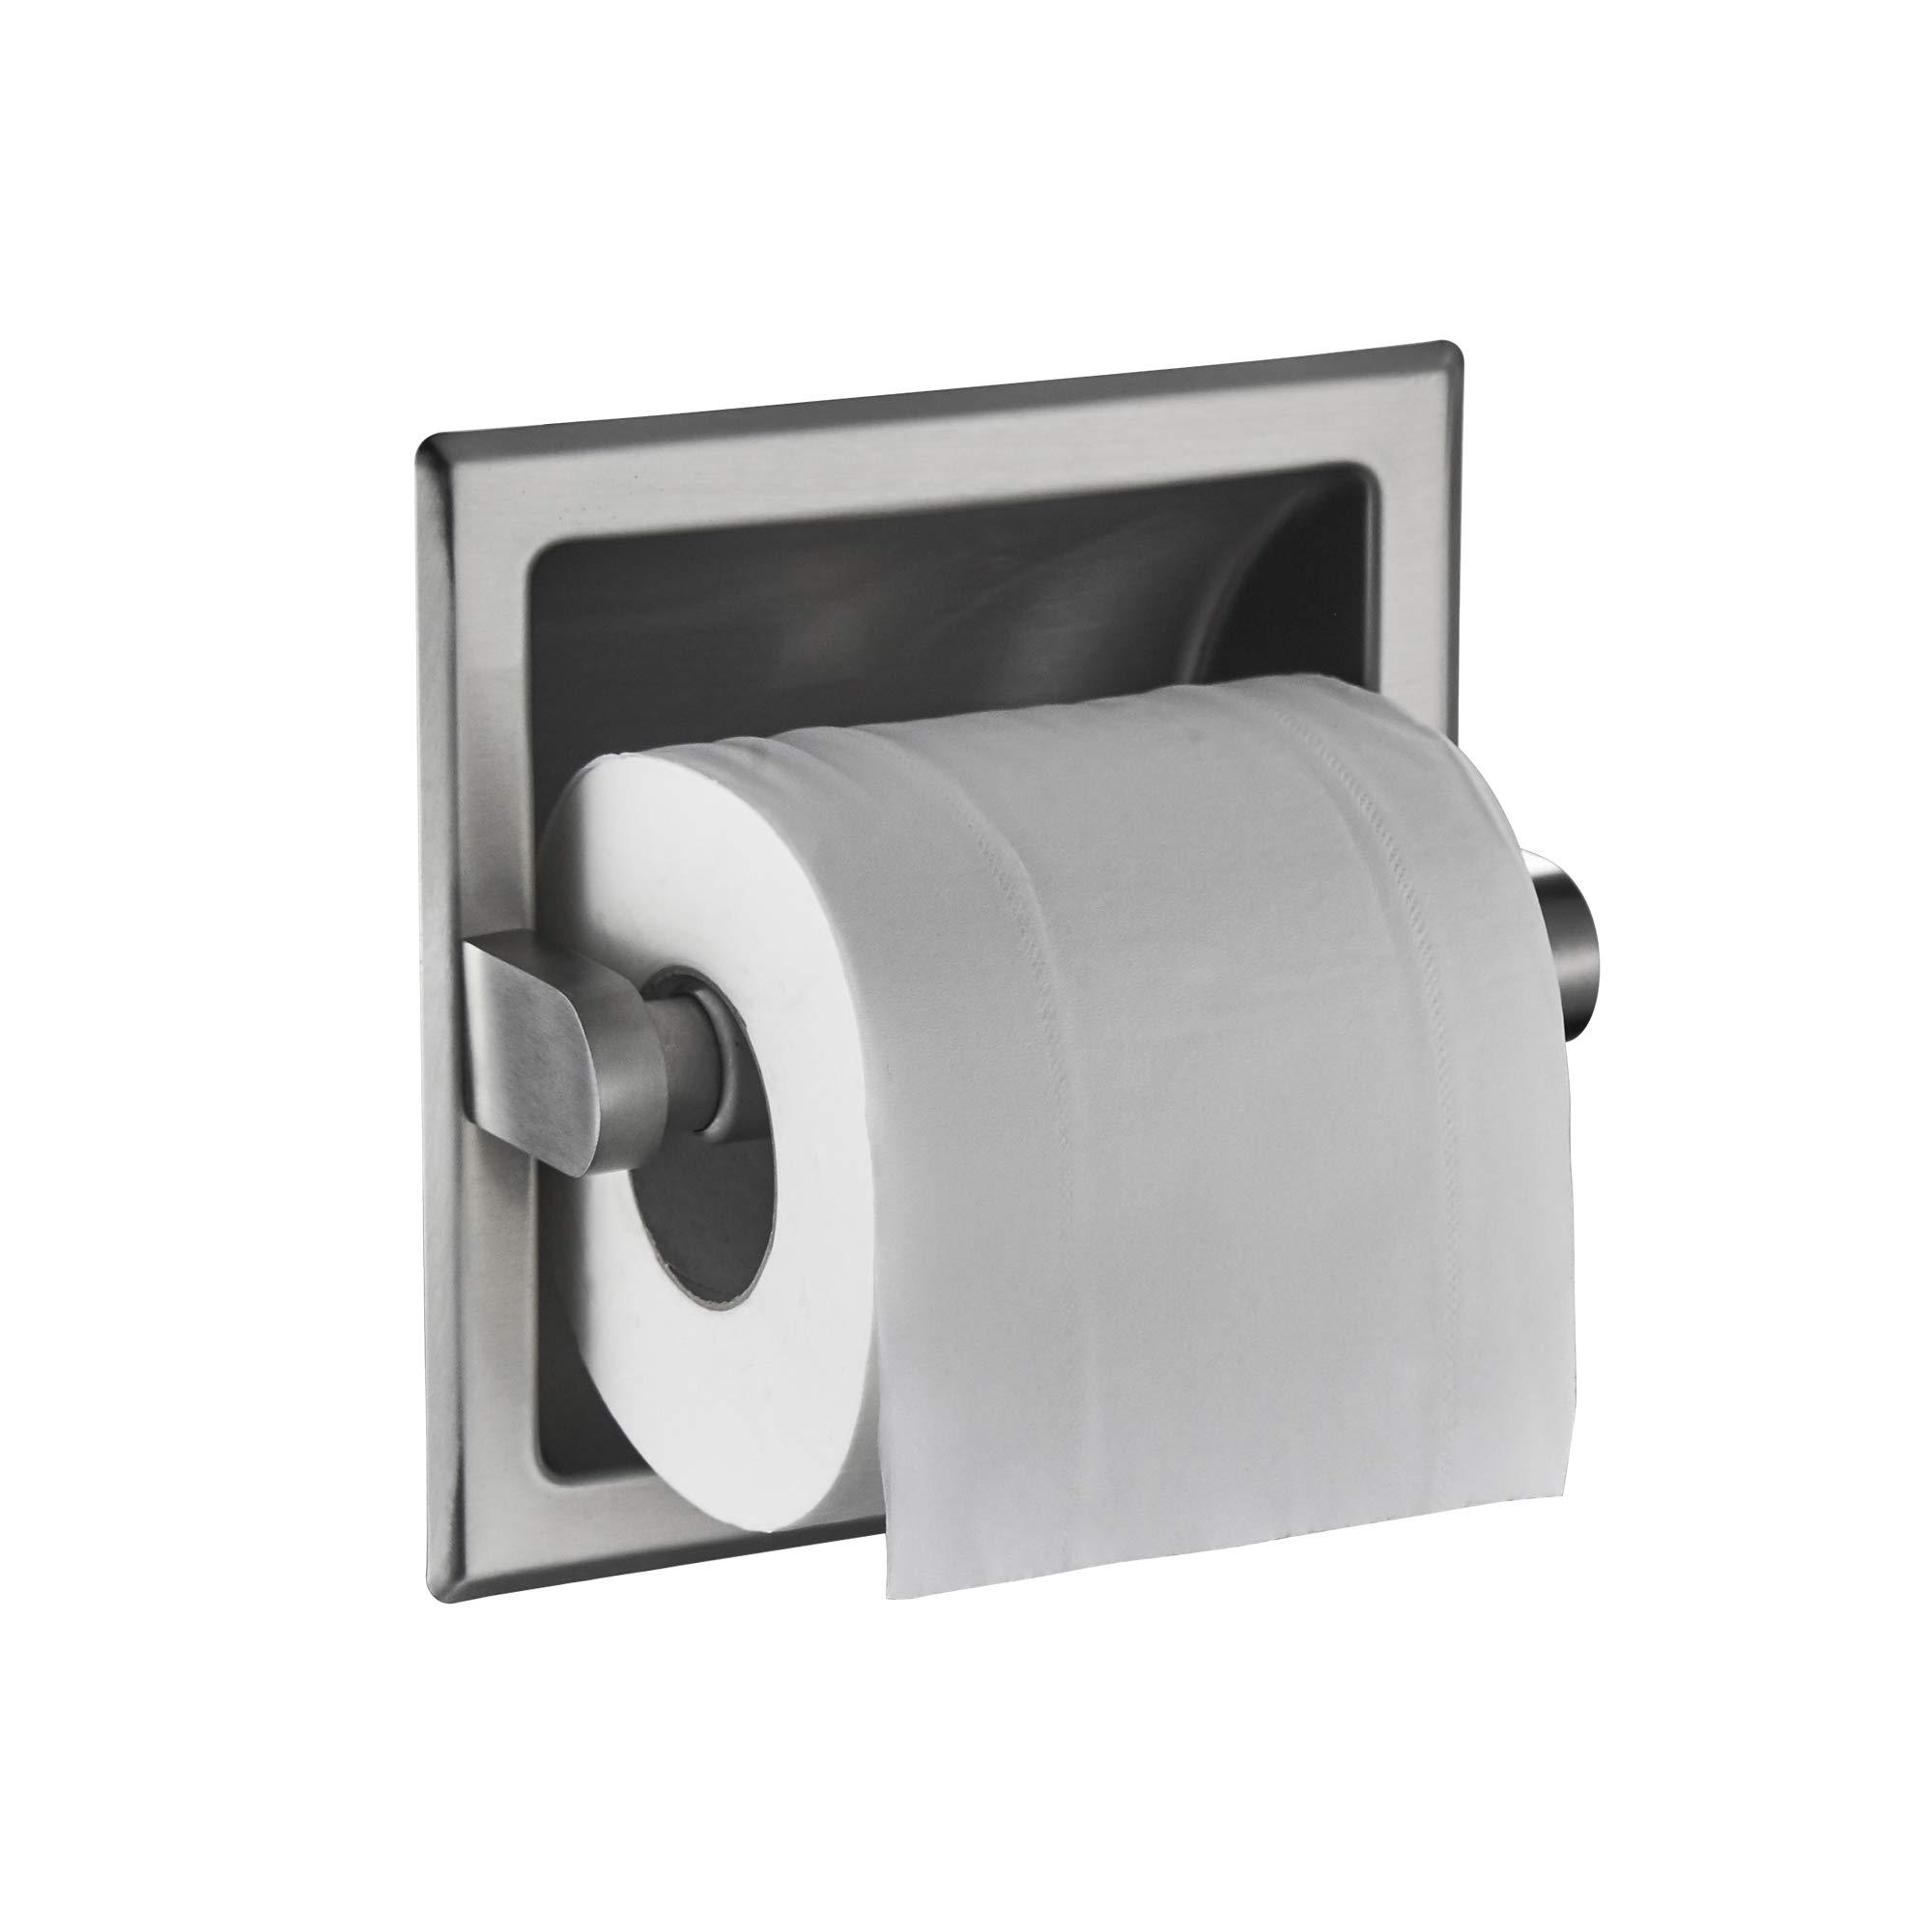 JunSun Brushed Nickel Recessed Toilet Paper Holder Wall Toilet Paper Holder Recessed Toilet Tissue Holder Stainless Steel Toilet Paper Holder Rear Mounting Bracket Included by JunSun (Image #4)